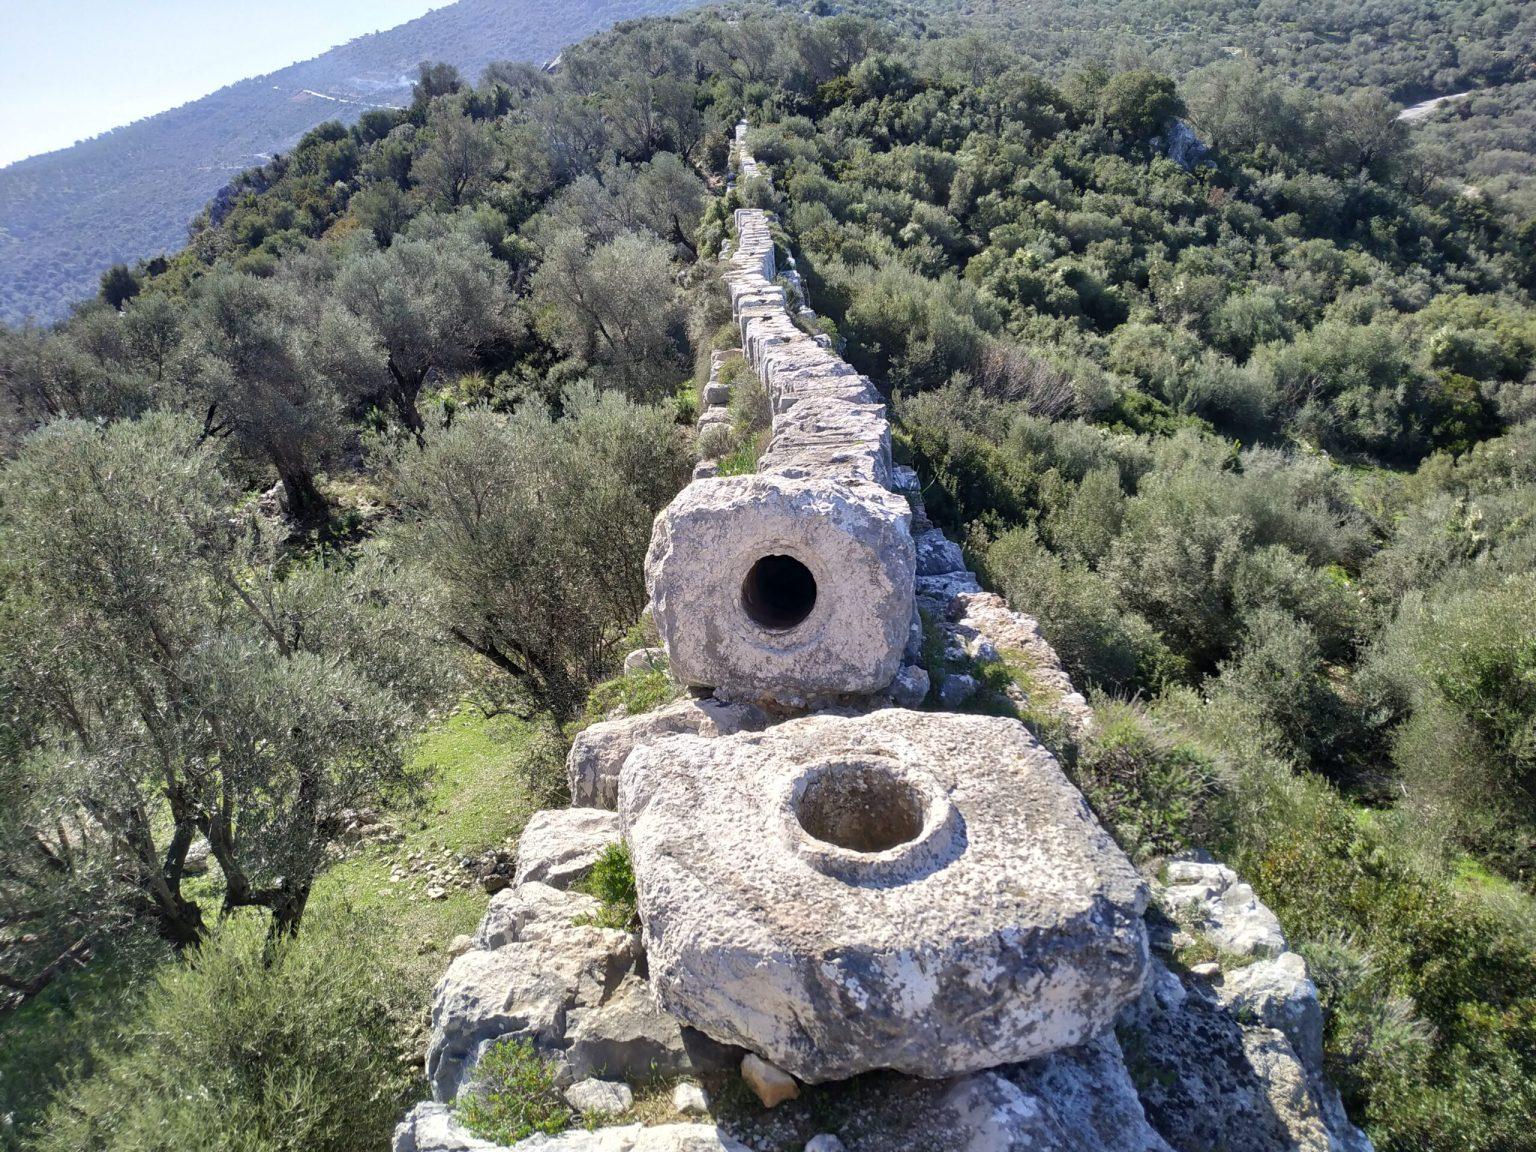 Xanthos vadisi gezi rehberi